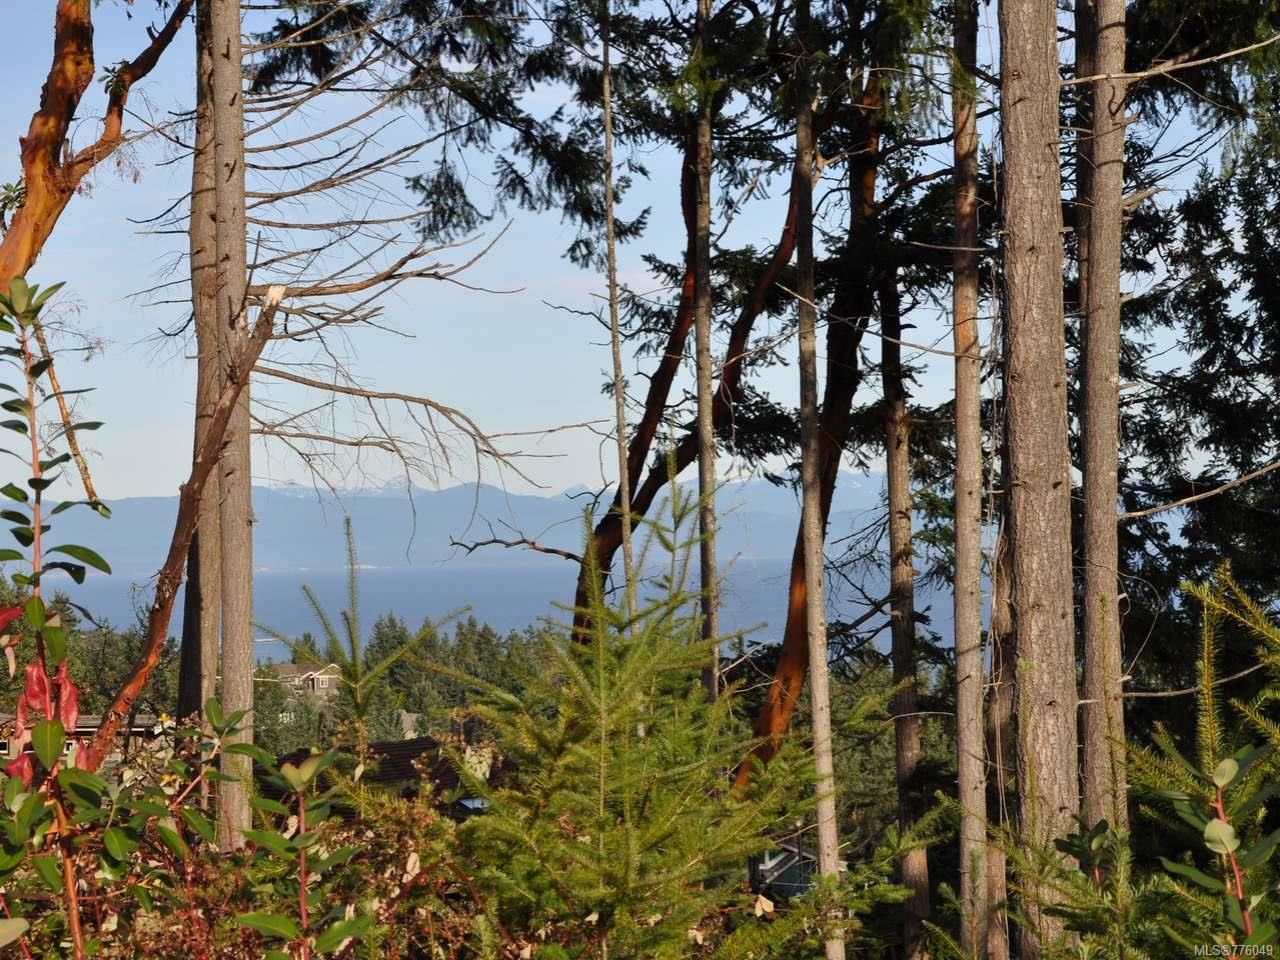 Main Photo: LOT 15 BONNINGTON DRIVE in NANOOSE BAY: PQ Fairwinds Land for sale (Parksville/Qualicum)  : MLS®# 776049